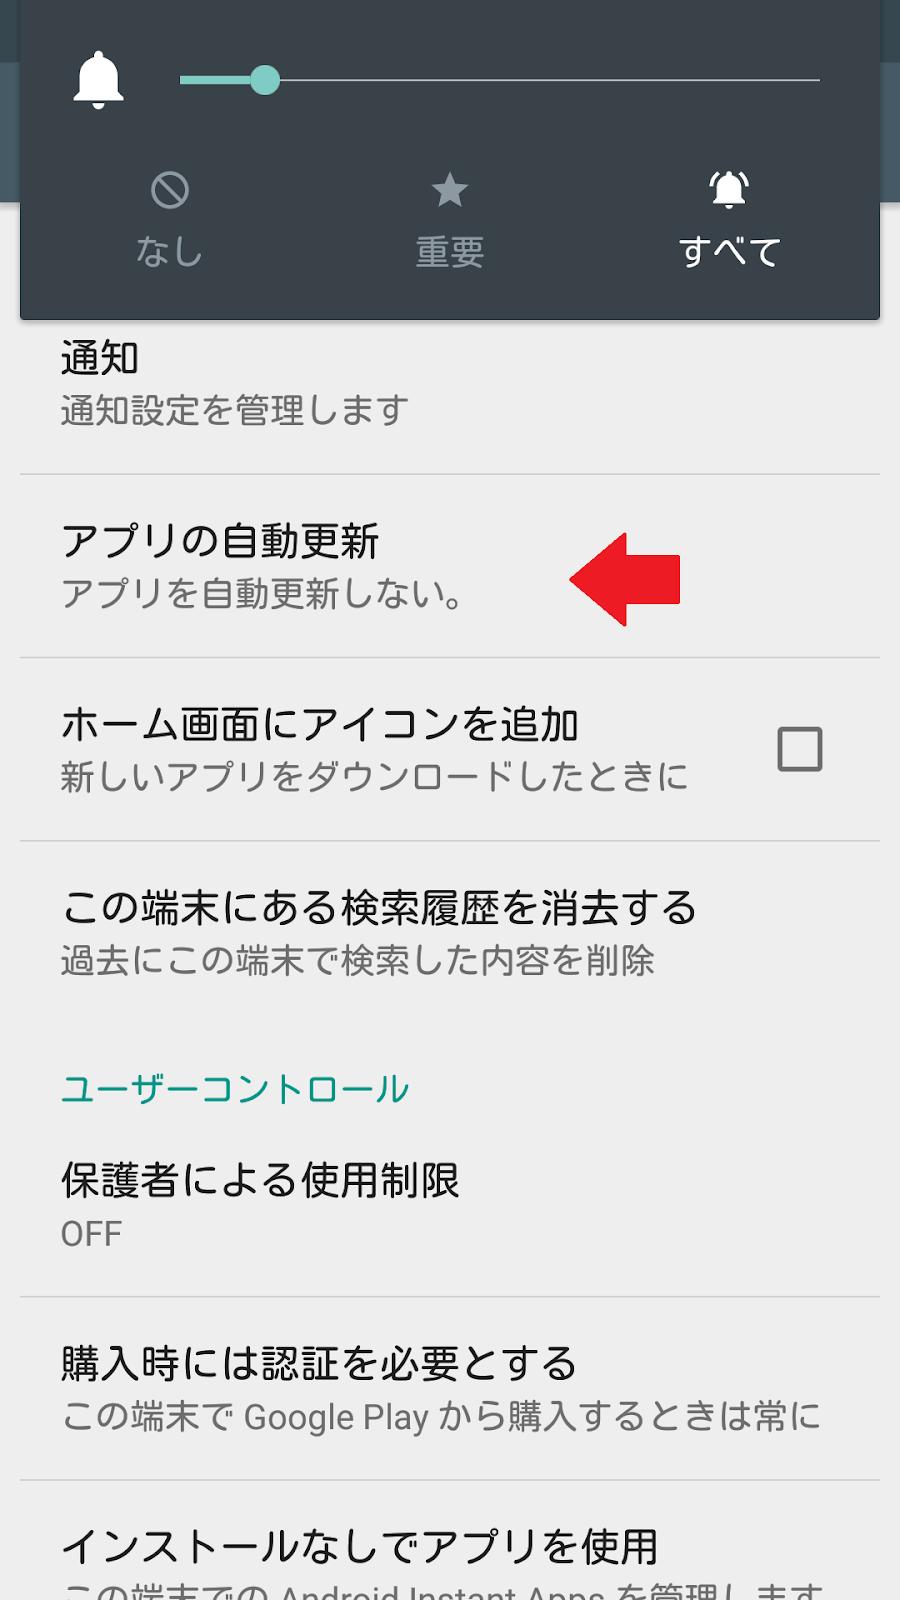 Google Playのアプリ自動更新をオフ